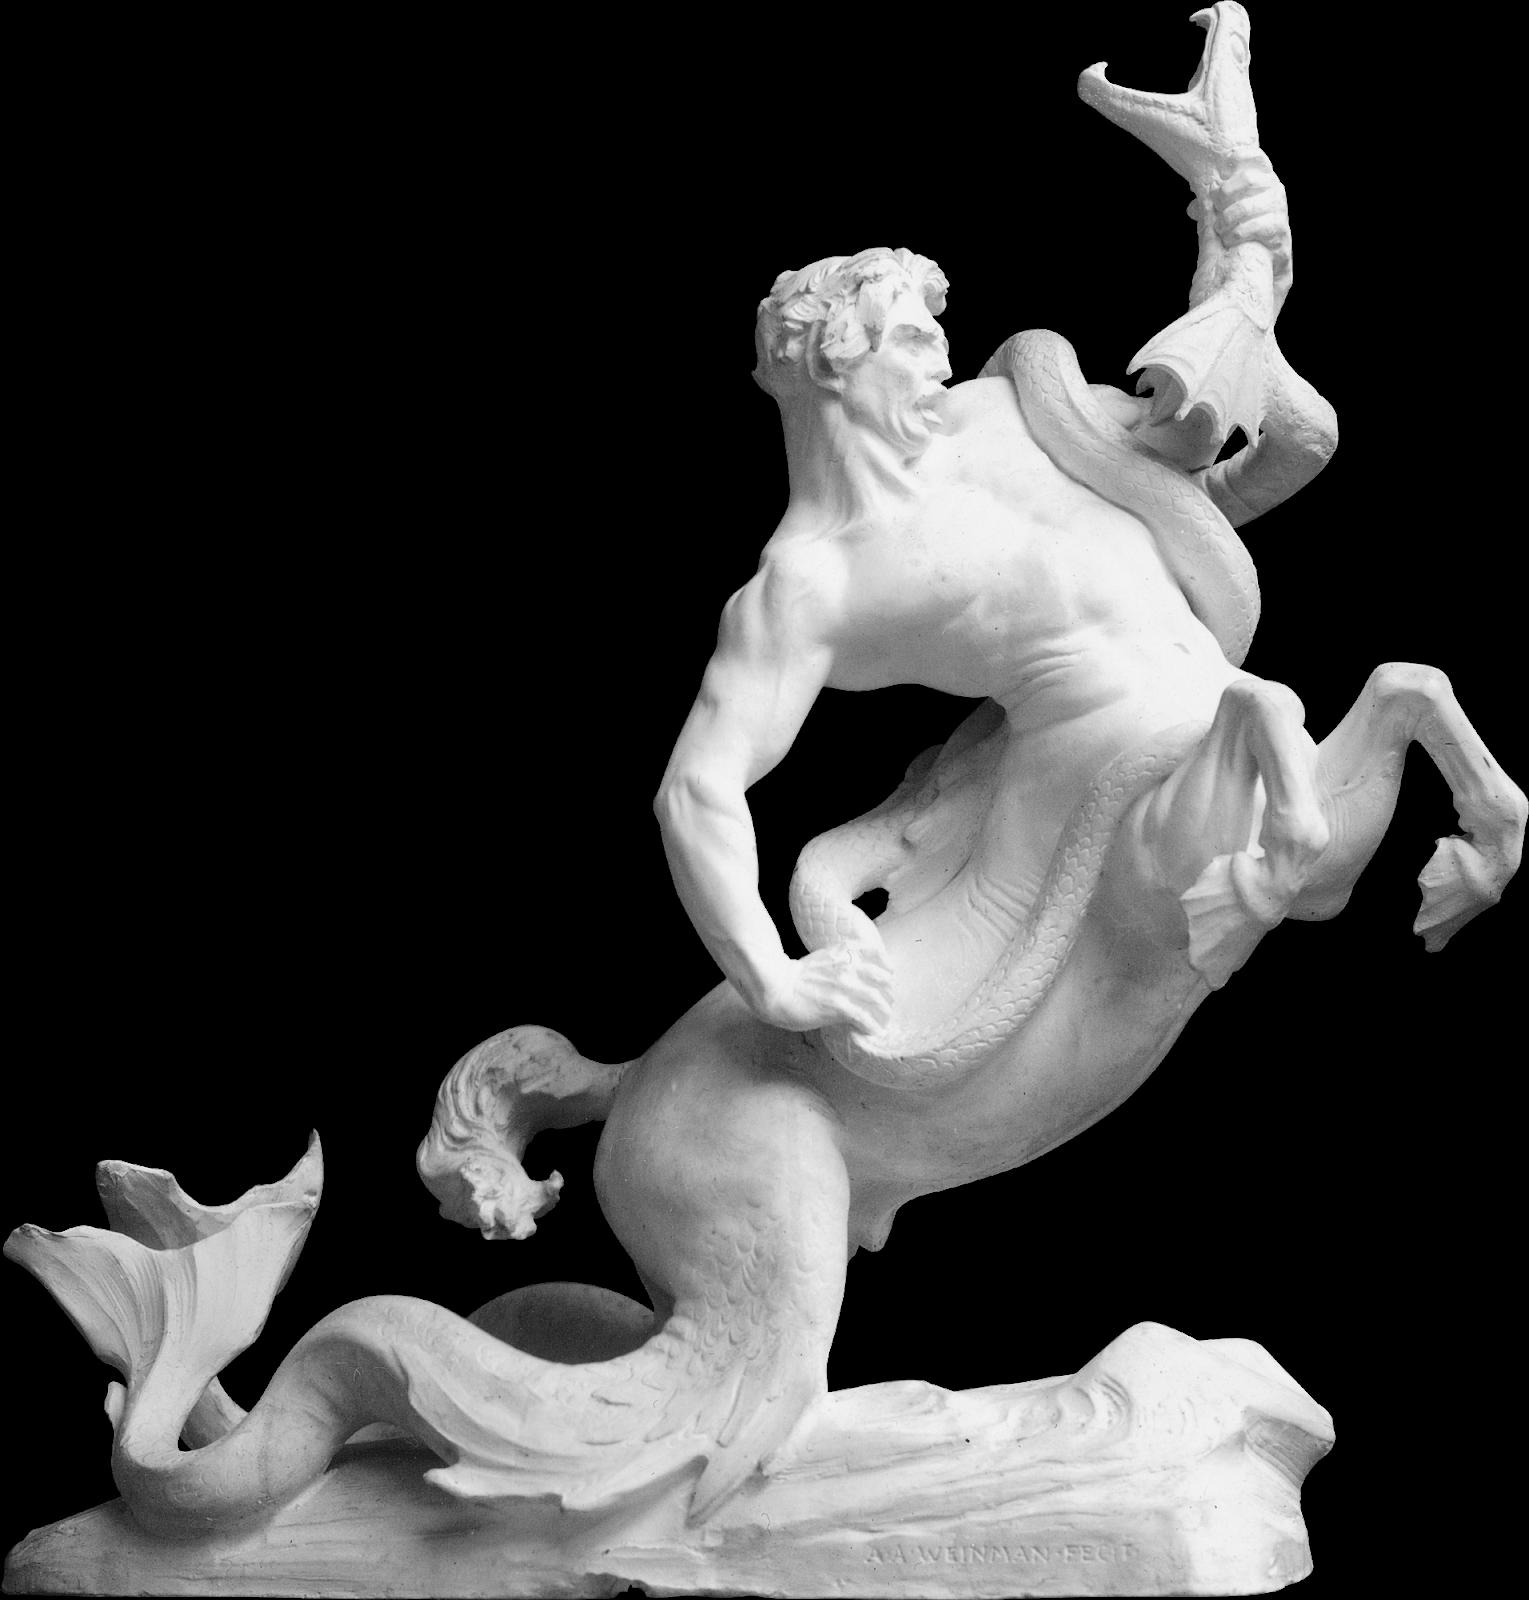 http://3.bp.blogspot.com/-Ylcf4jjXE0k/UwUi4TccLAI/AAAAAAAAHgc/V9UZM1HaxmQ/s1600/Triton+statue+centaure.png